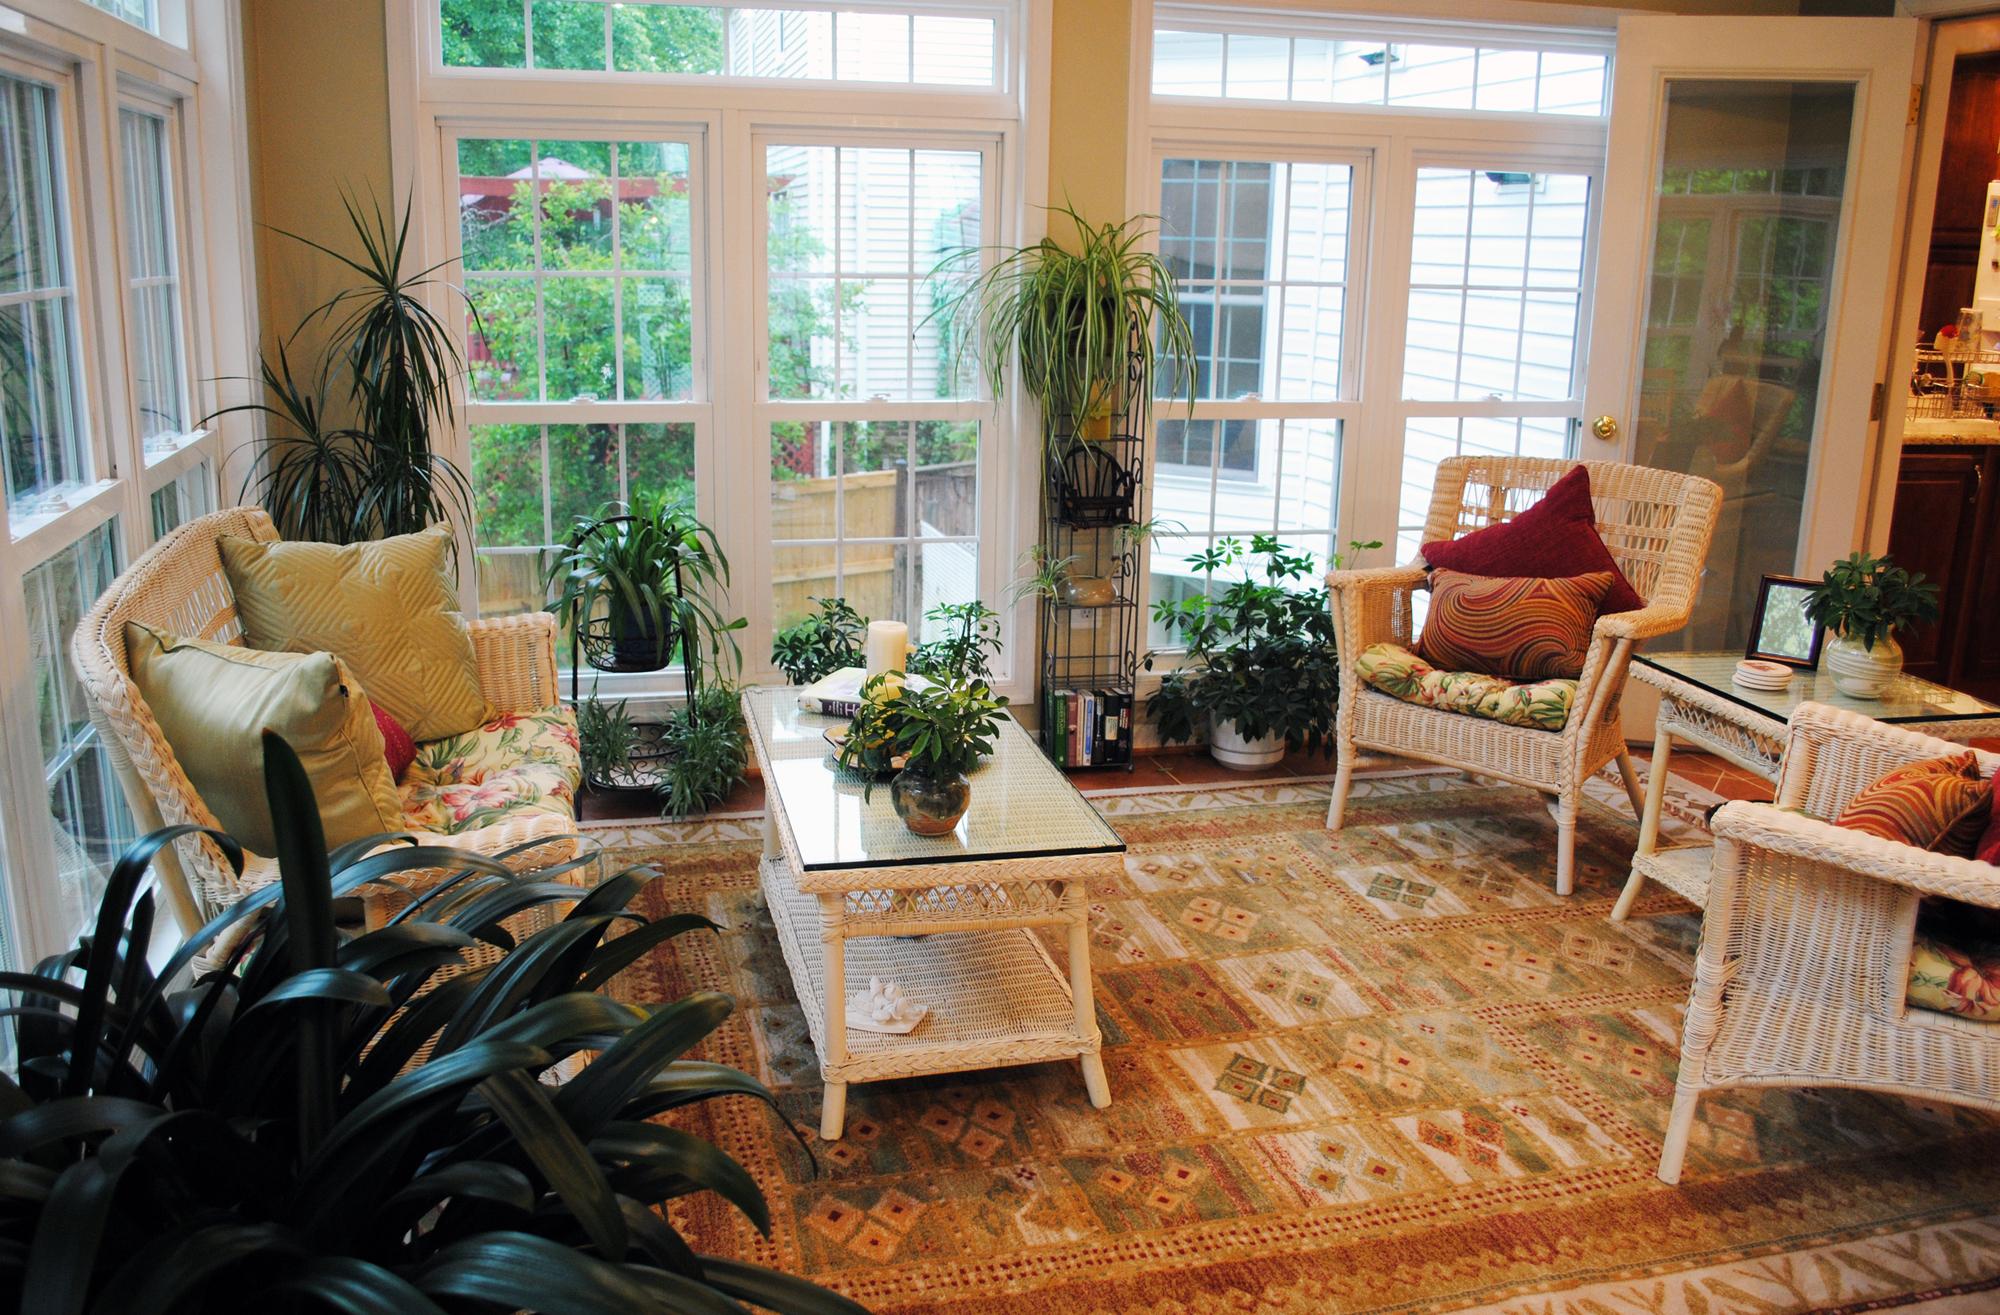 Living Room Furniture Northern Va Northern Virginia Remodeling Information Lensis Builders Inc